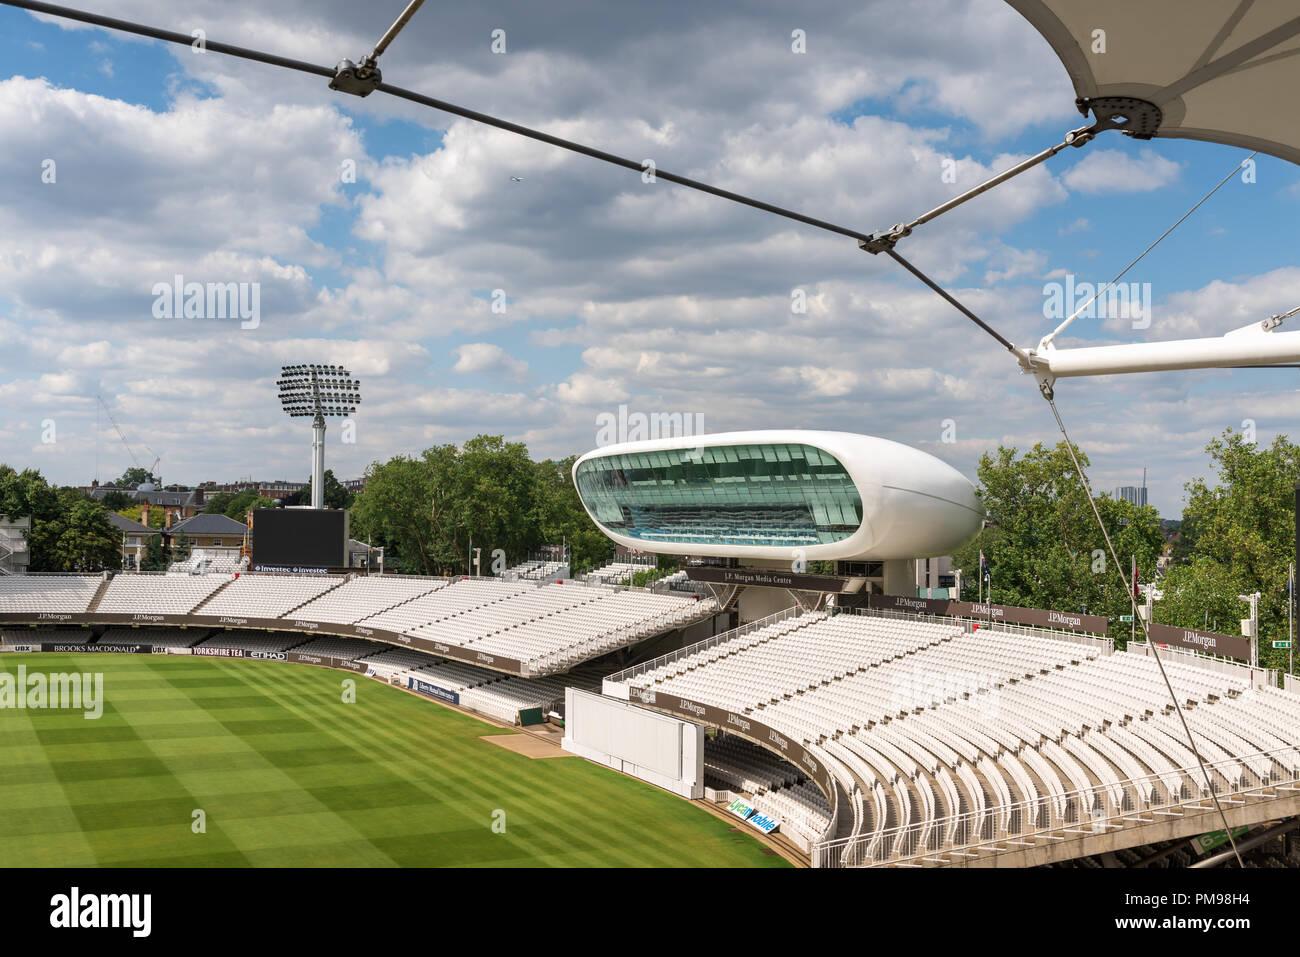 J. P. Morgan Media Centre, Lords Cricket Ground, London, UK - Stock Image